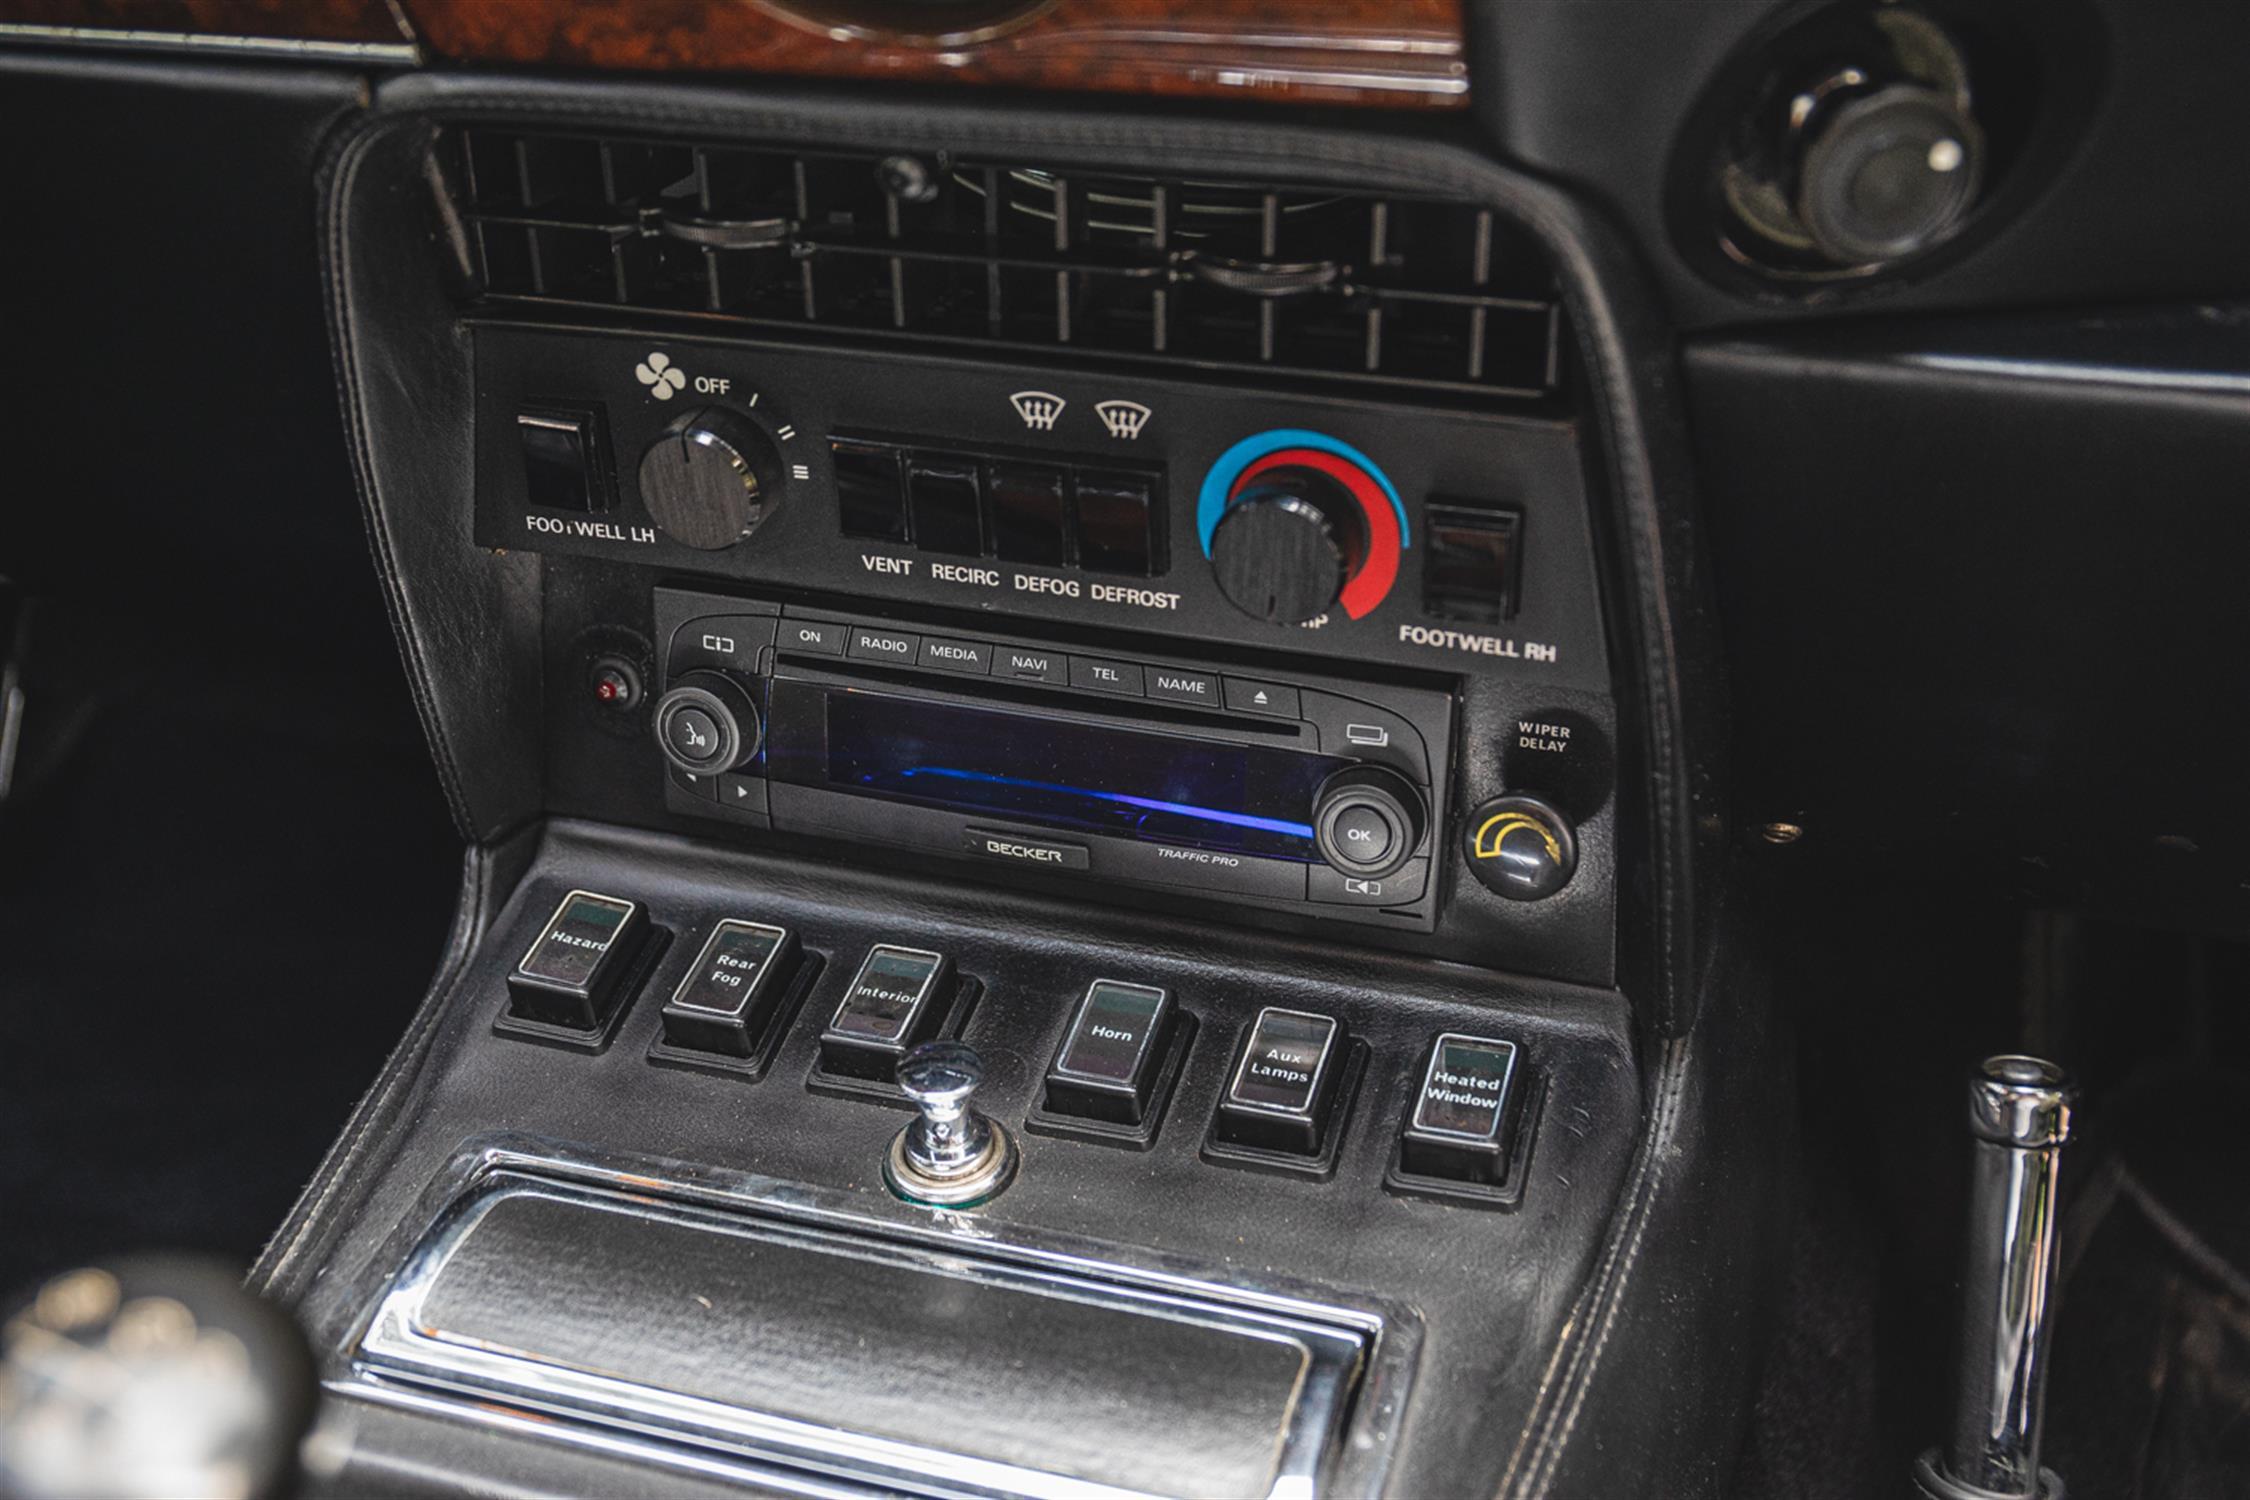 1990 Aston Martin V8 Vantage Coupe X-Pack (Manual) - Image 10 of 10